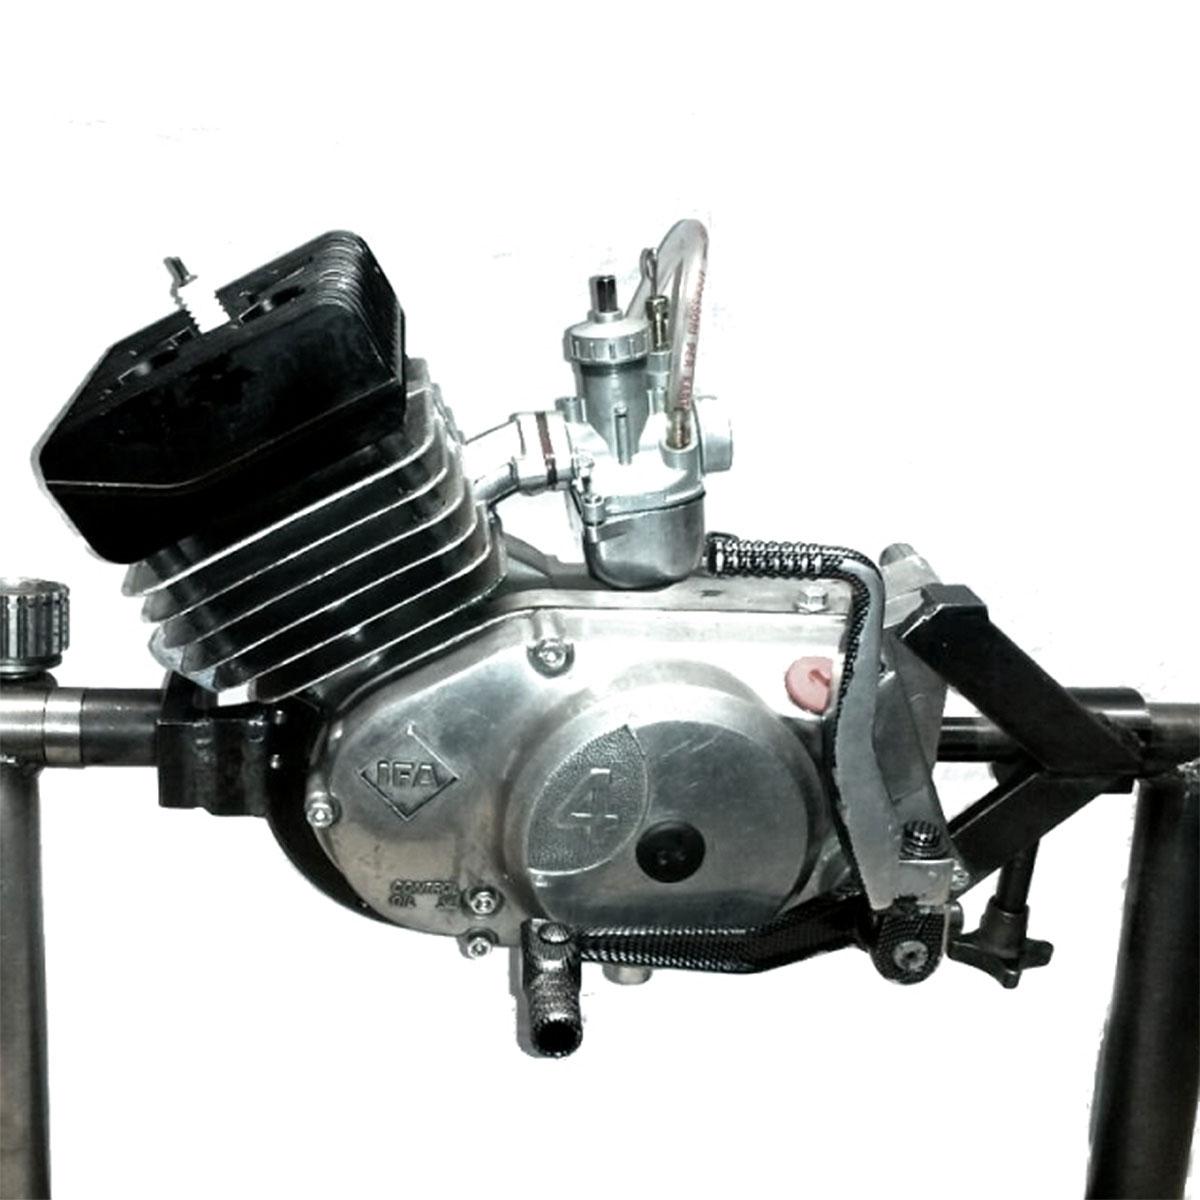 Motorkonfigurator